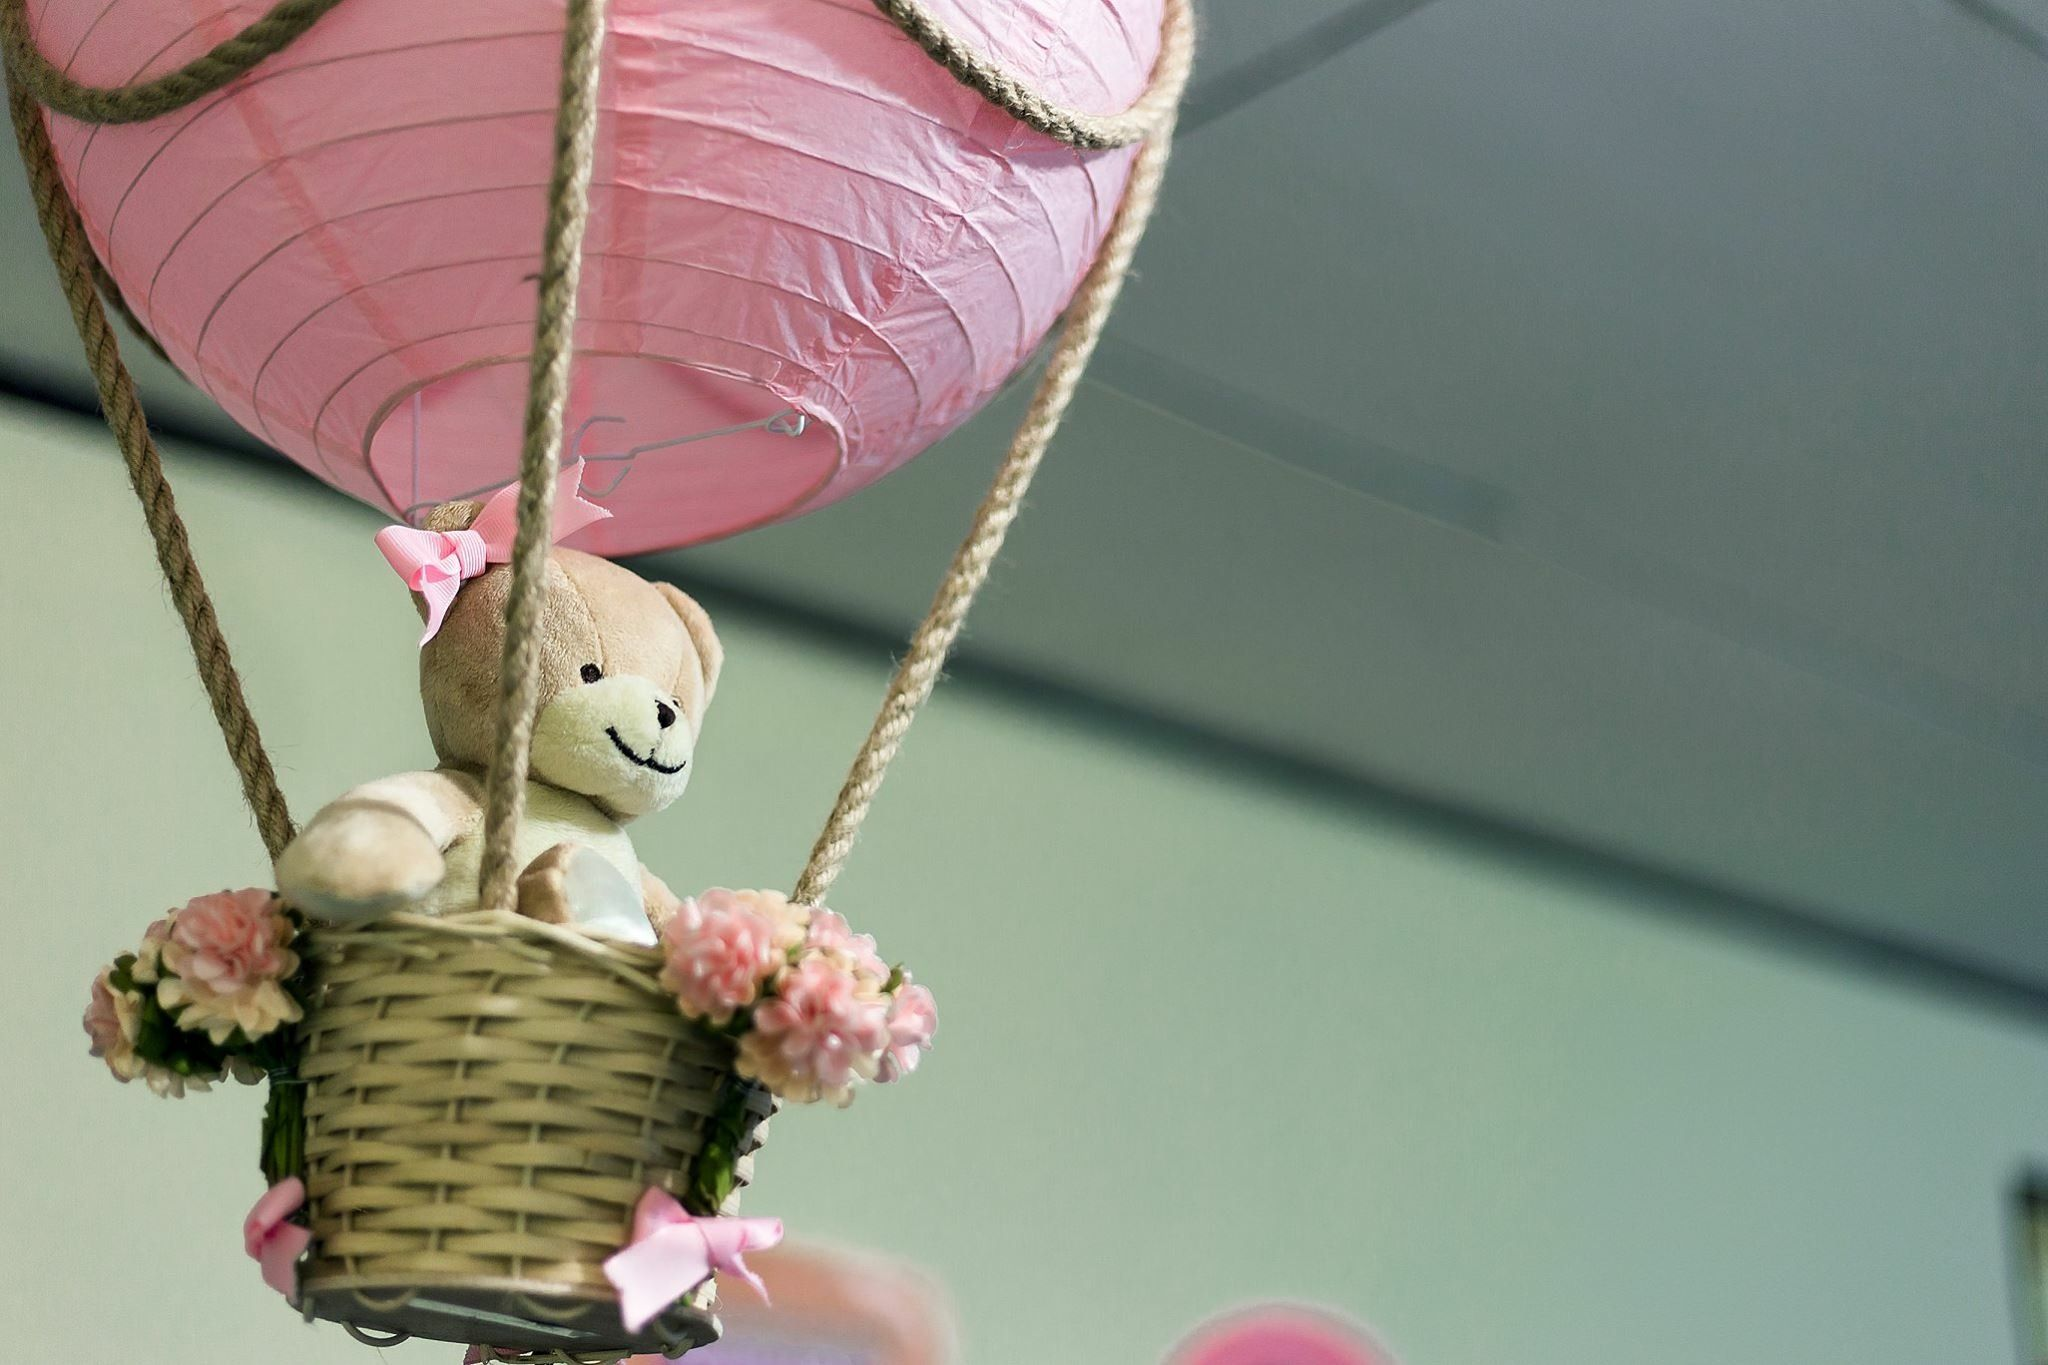 Osito y globo rosa